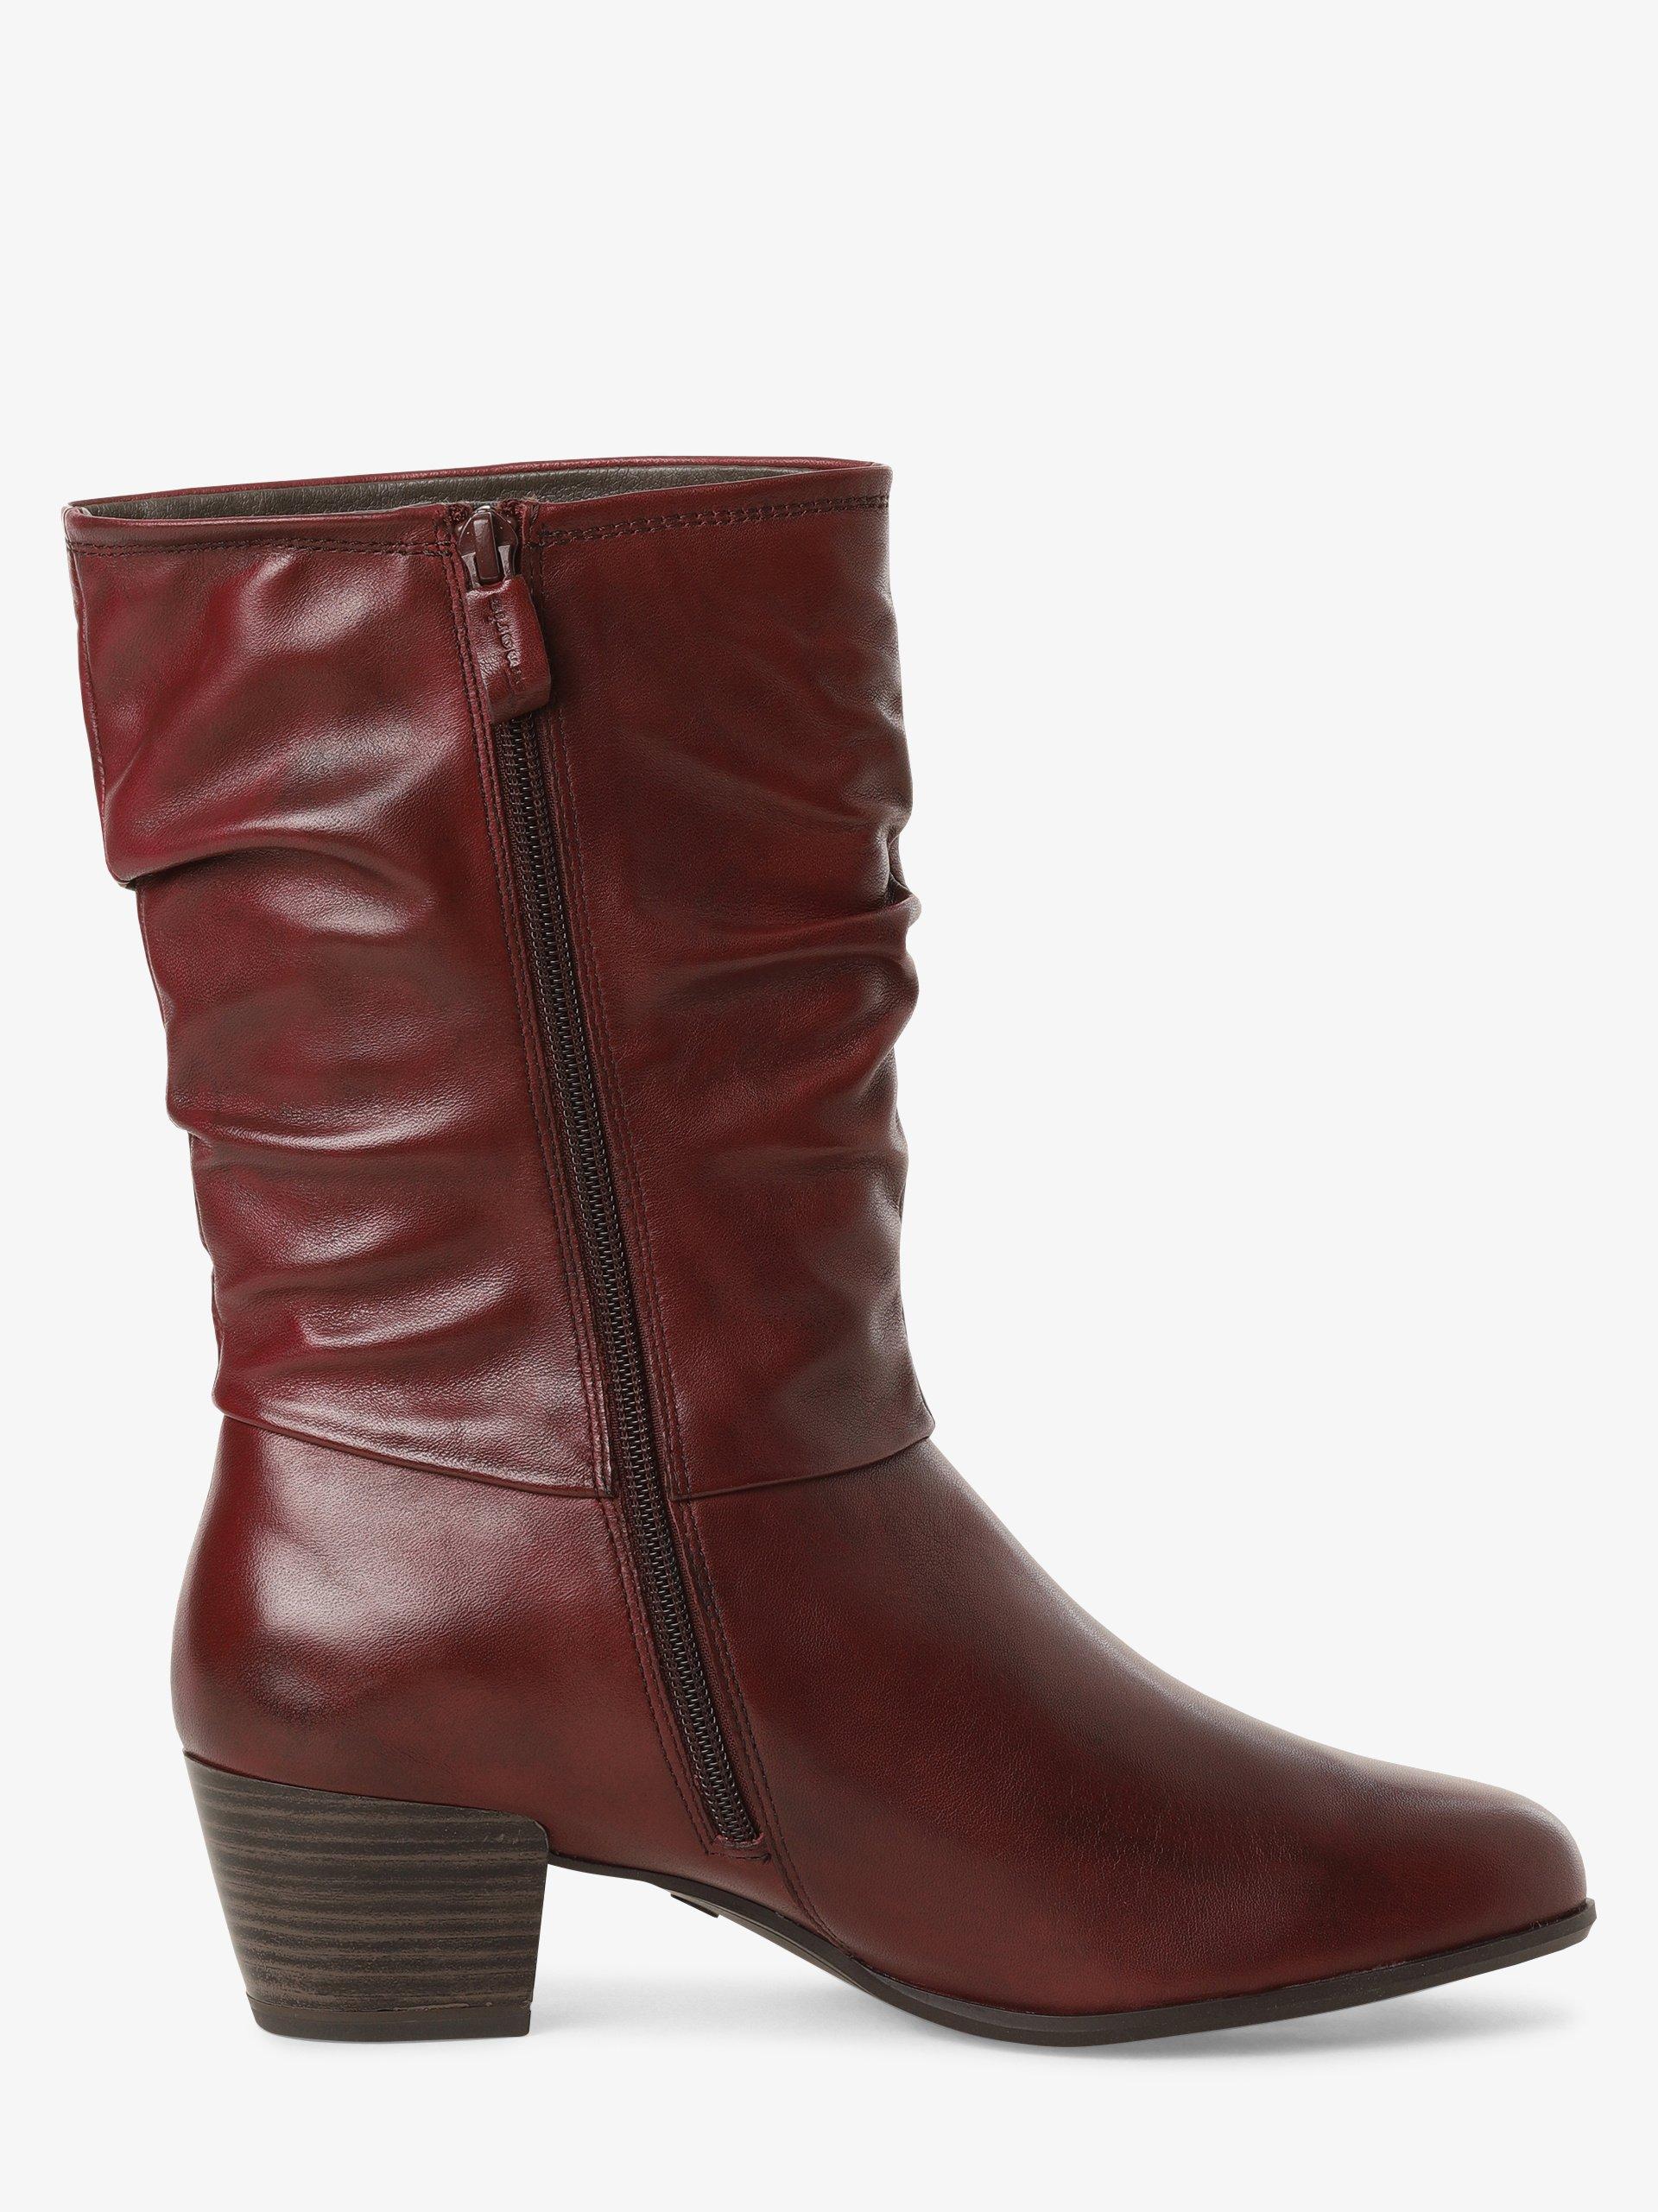 Tamaris Damen Stiefel aus Leder